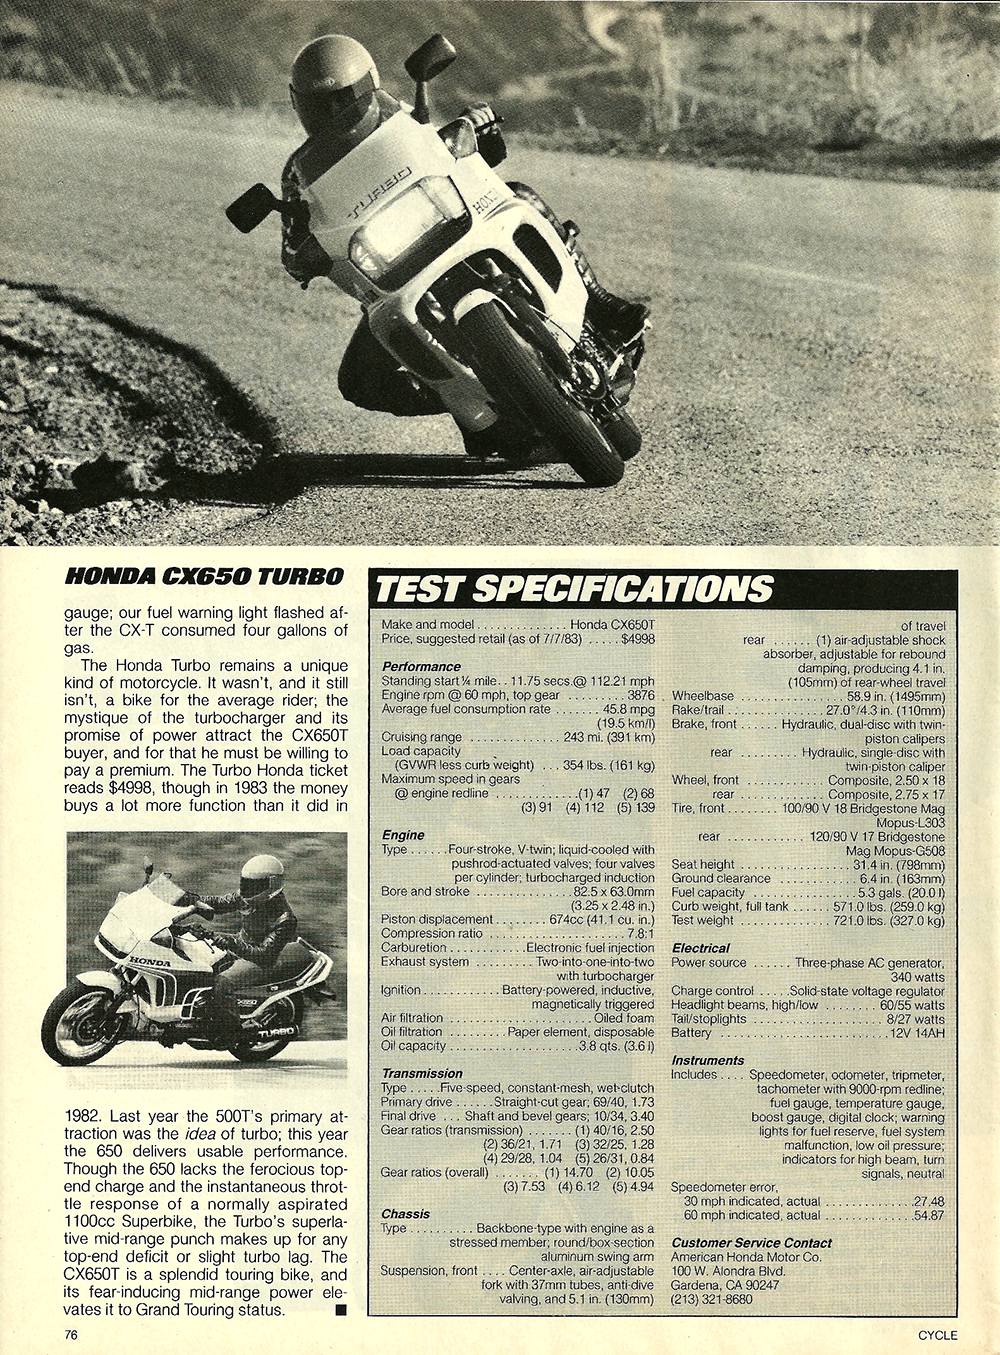 1983 Honda CX650 turbo road test 7.jpg